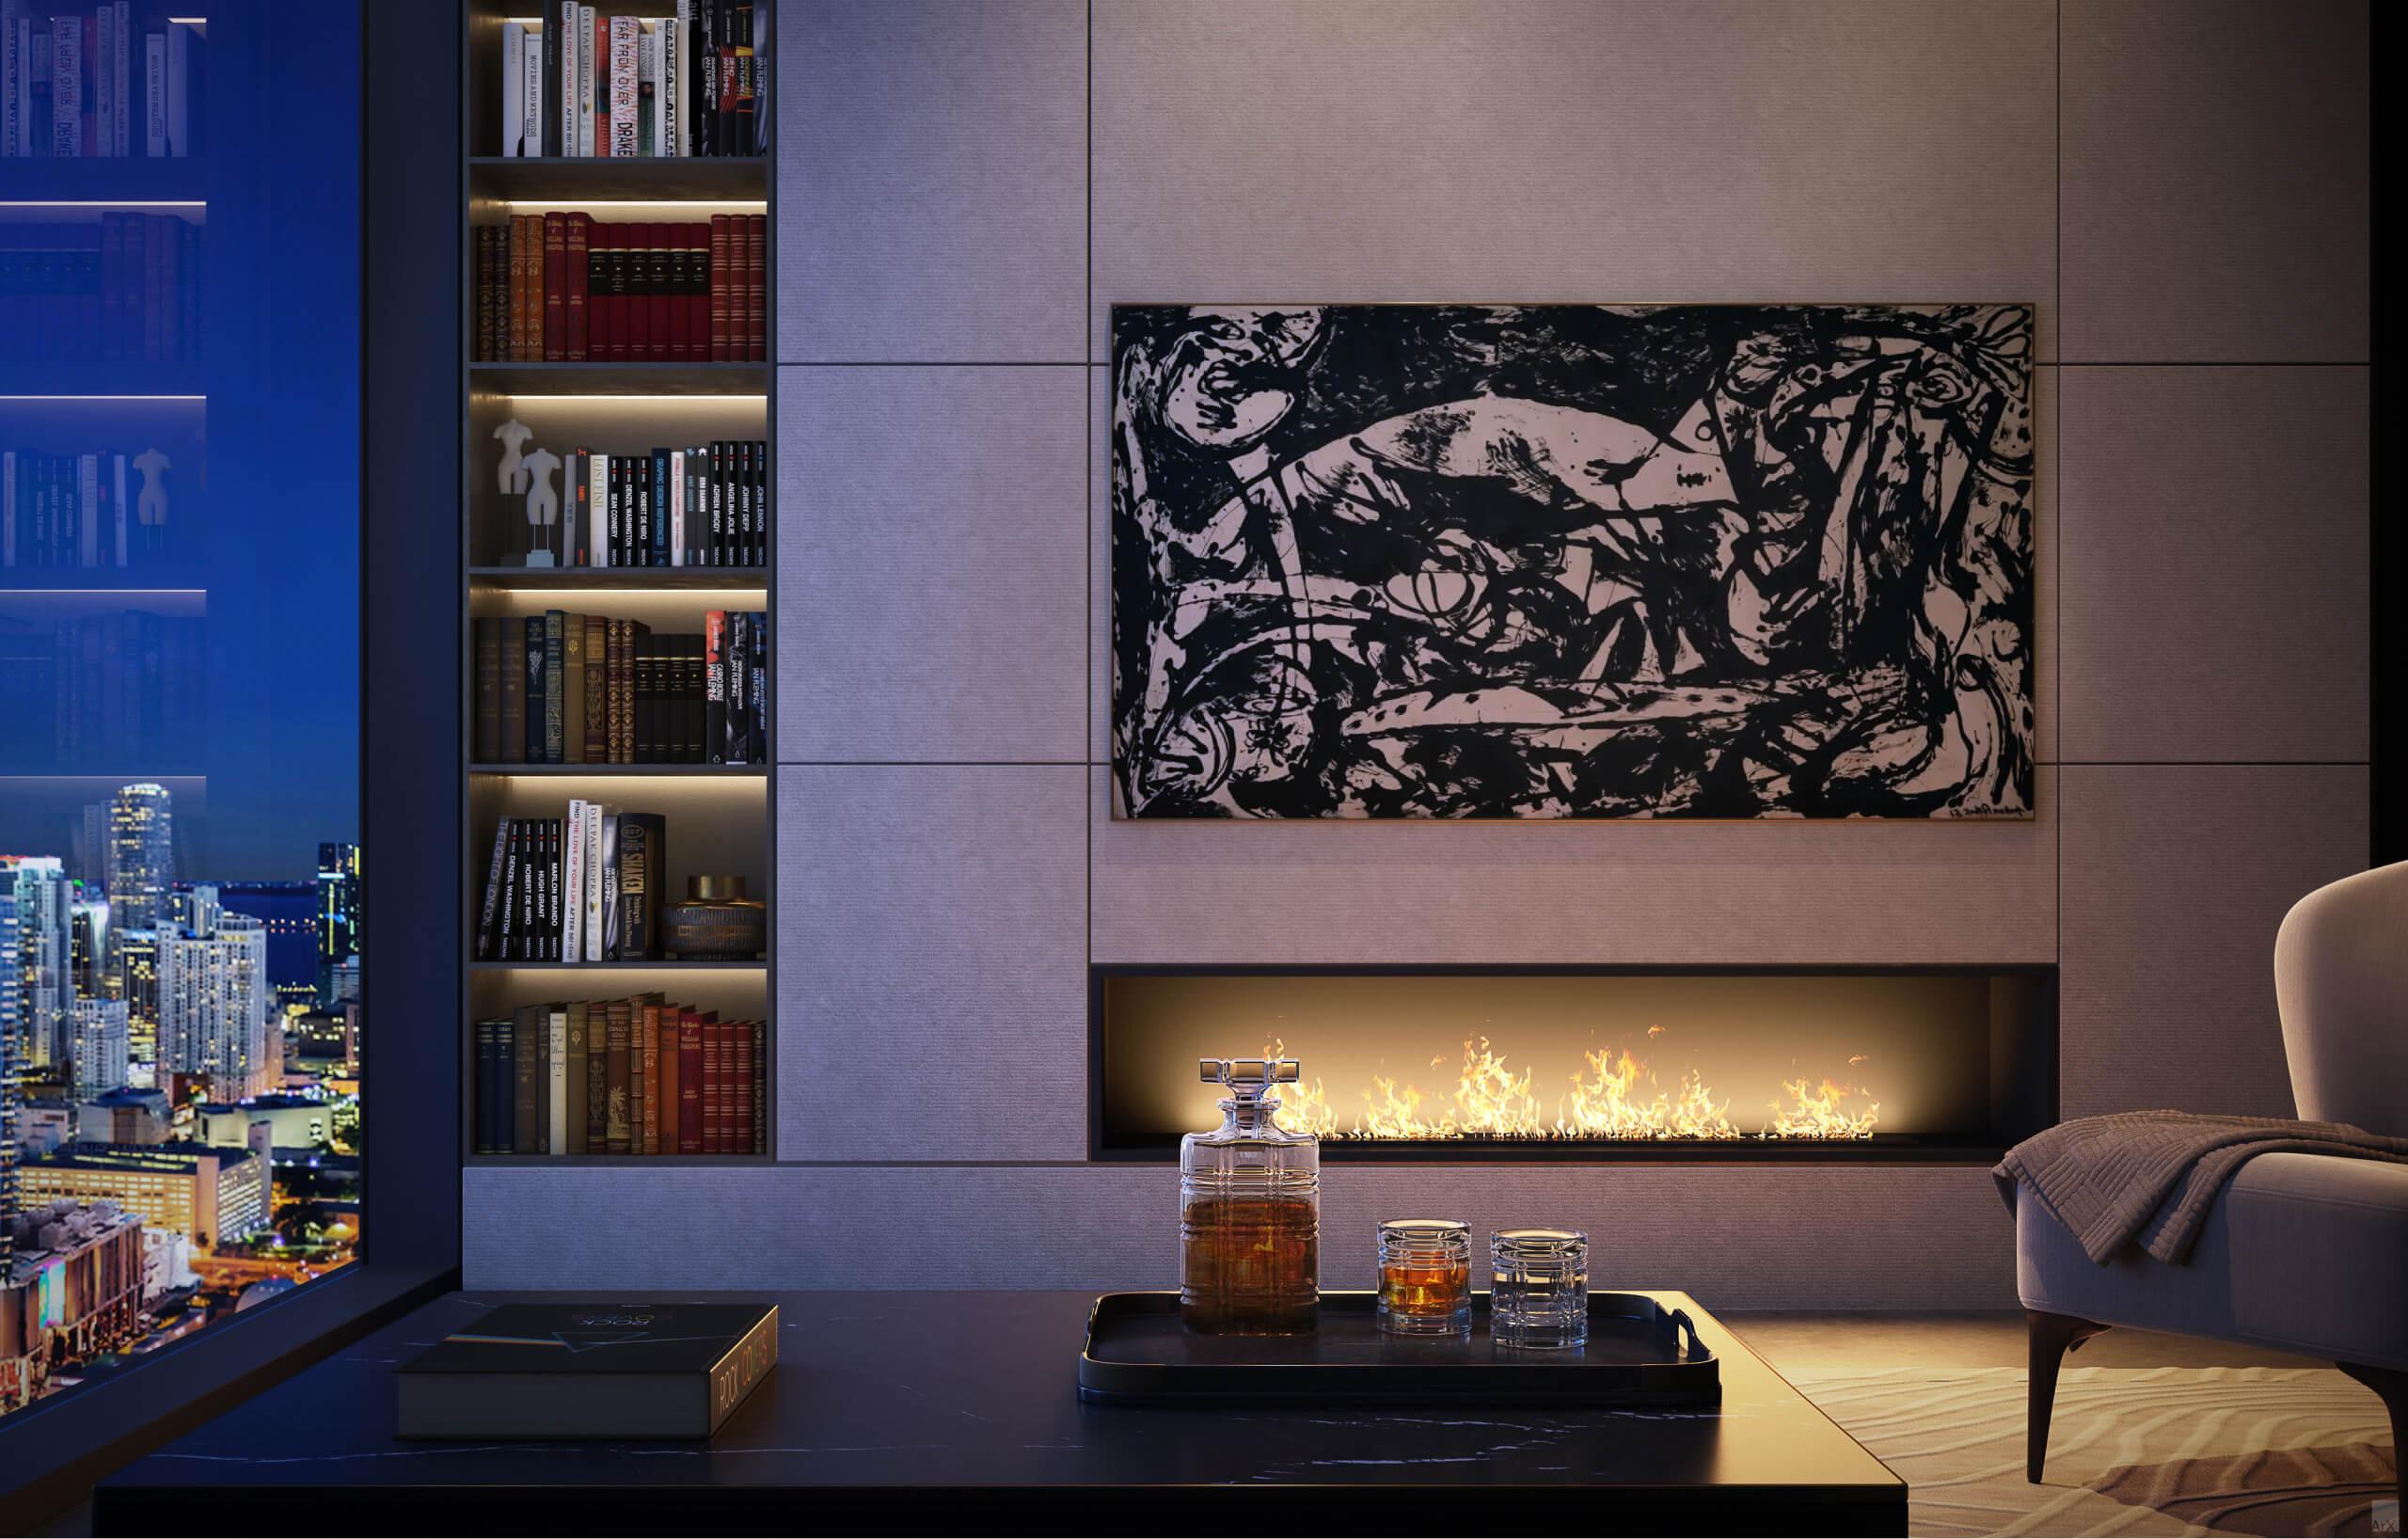 Living Room. Designed by AvroKO Hospitality Group & Studio Ramirez.